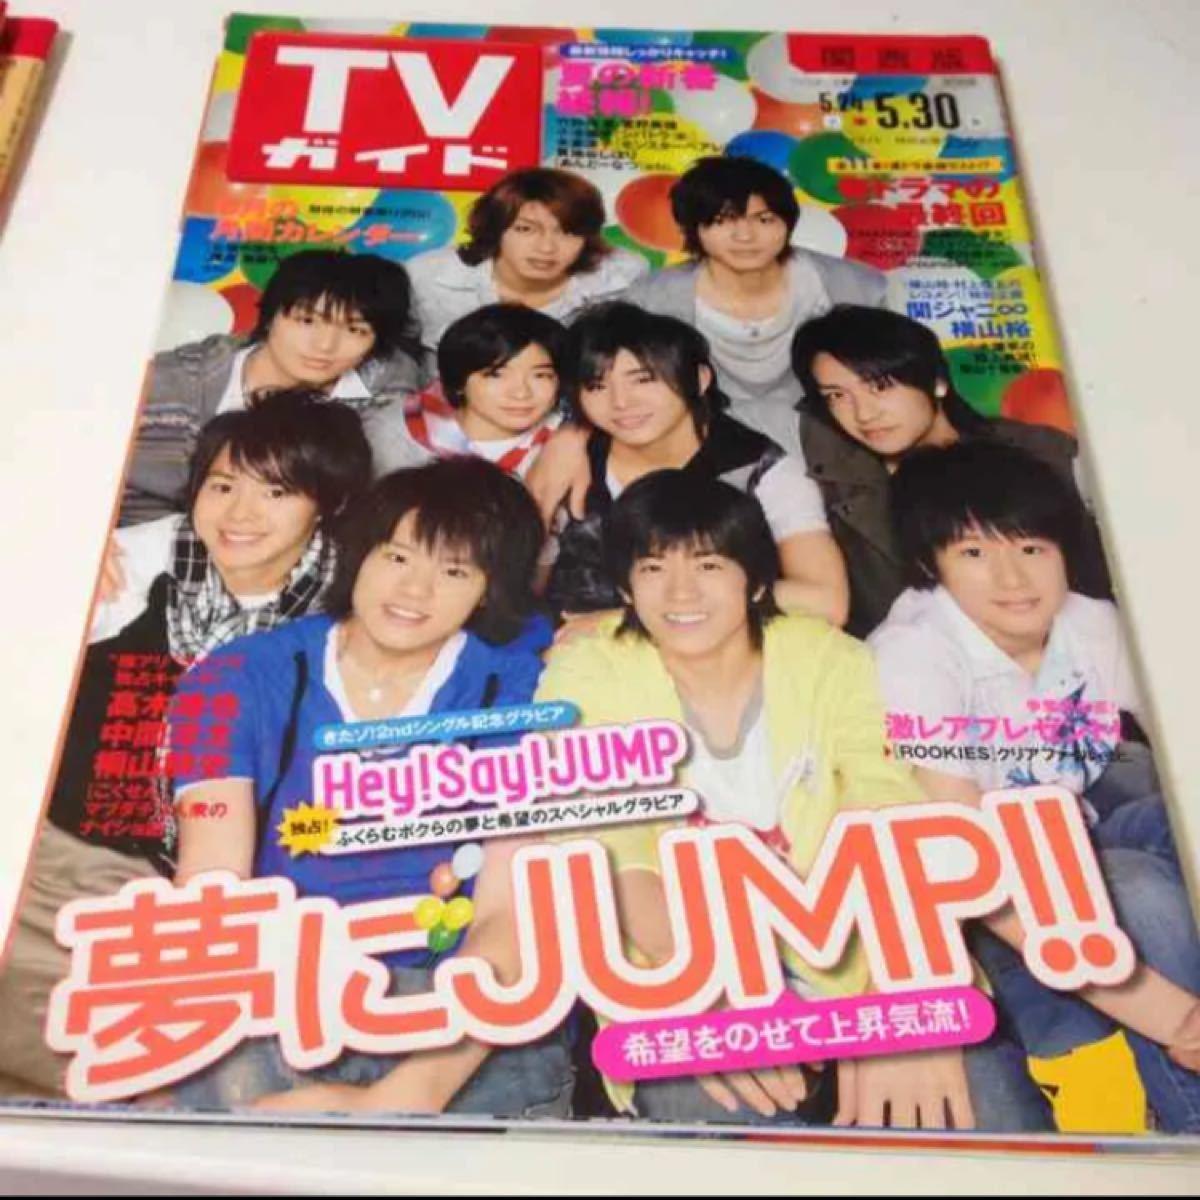 TVガイド 関西版 2008年 5/30号 Hey!Say!JUMP